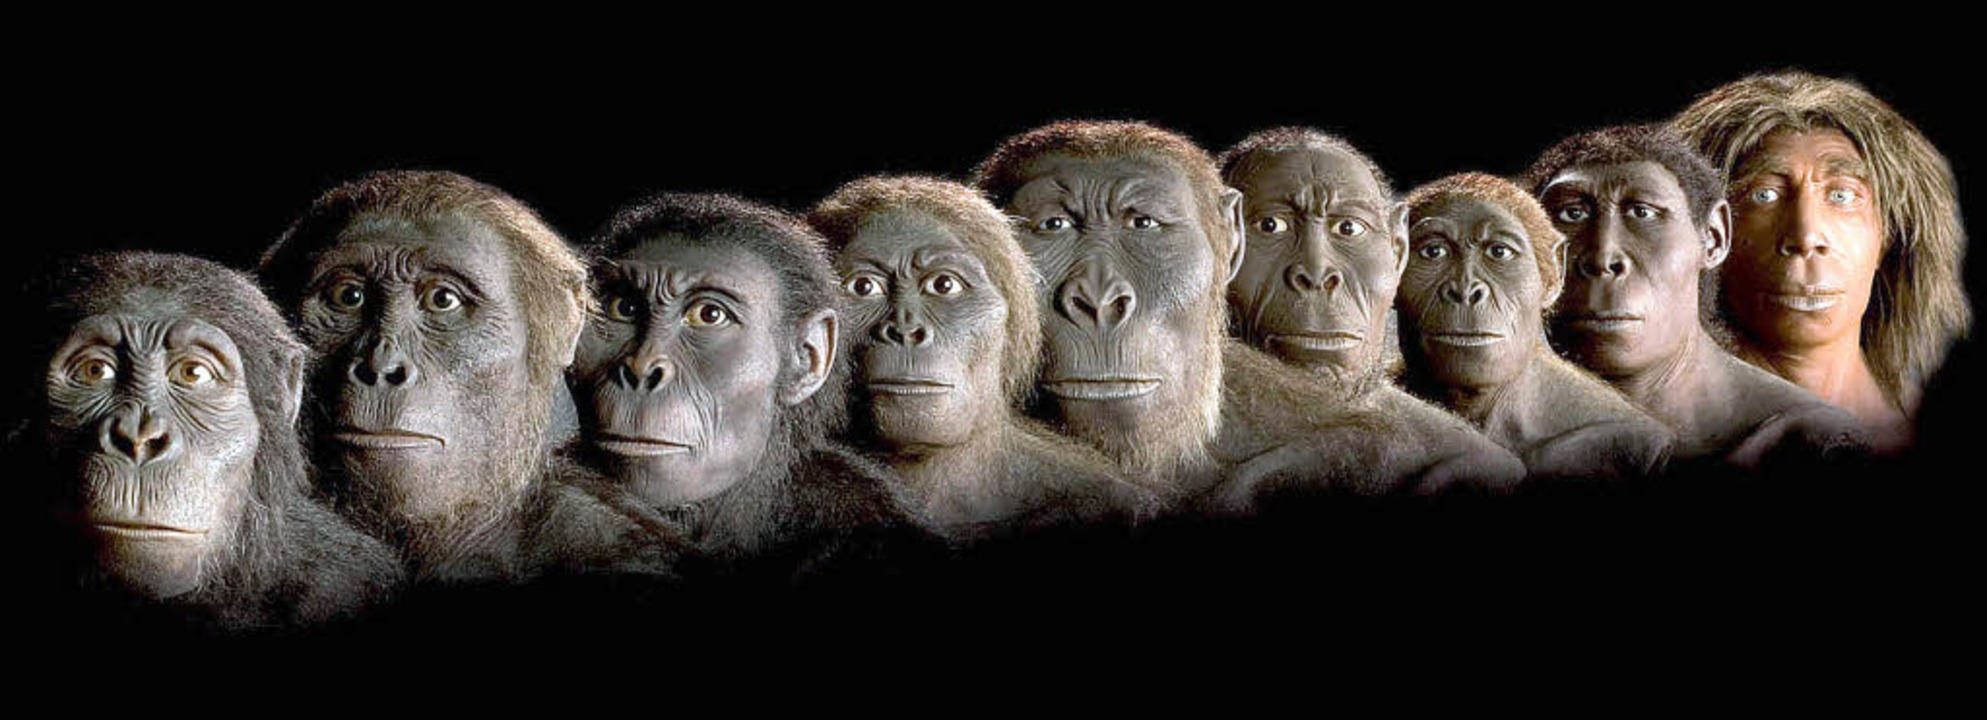 Entwicklung Affe Mensch